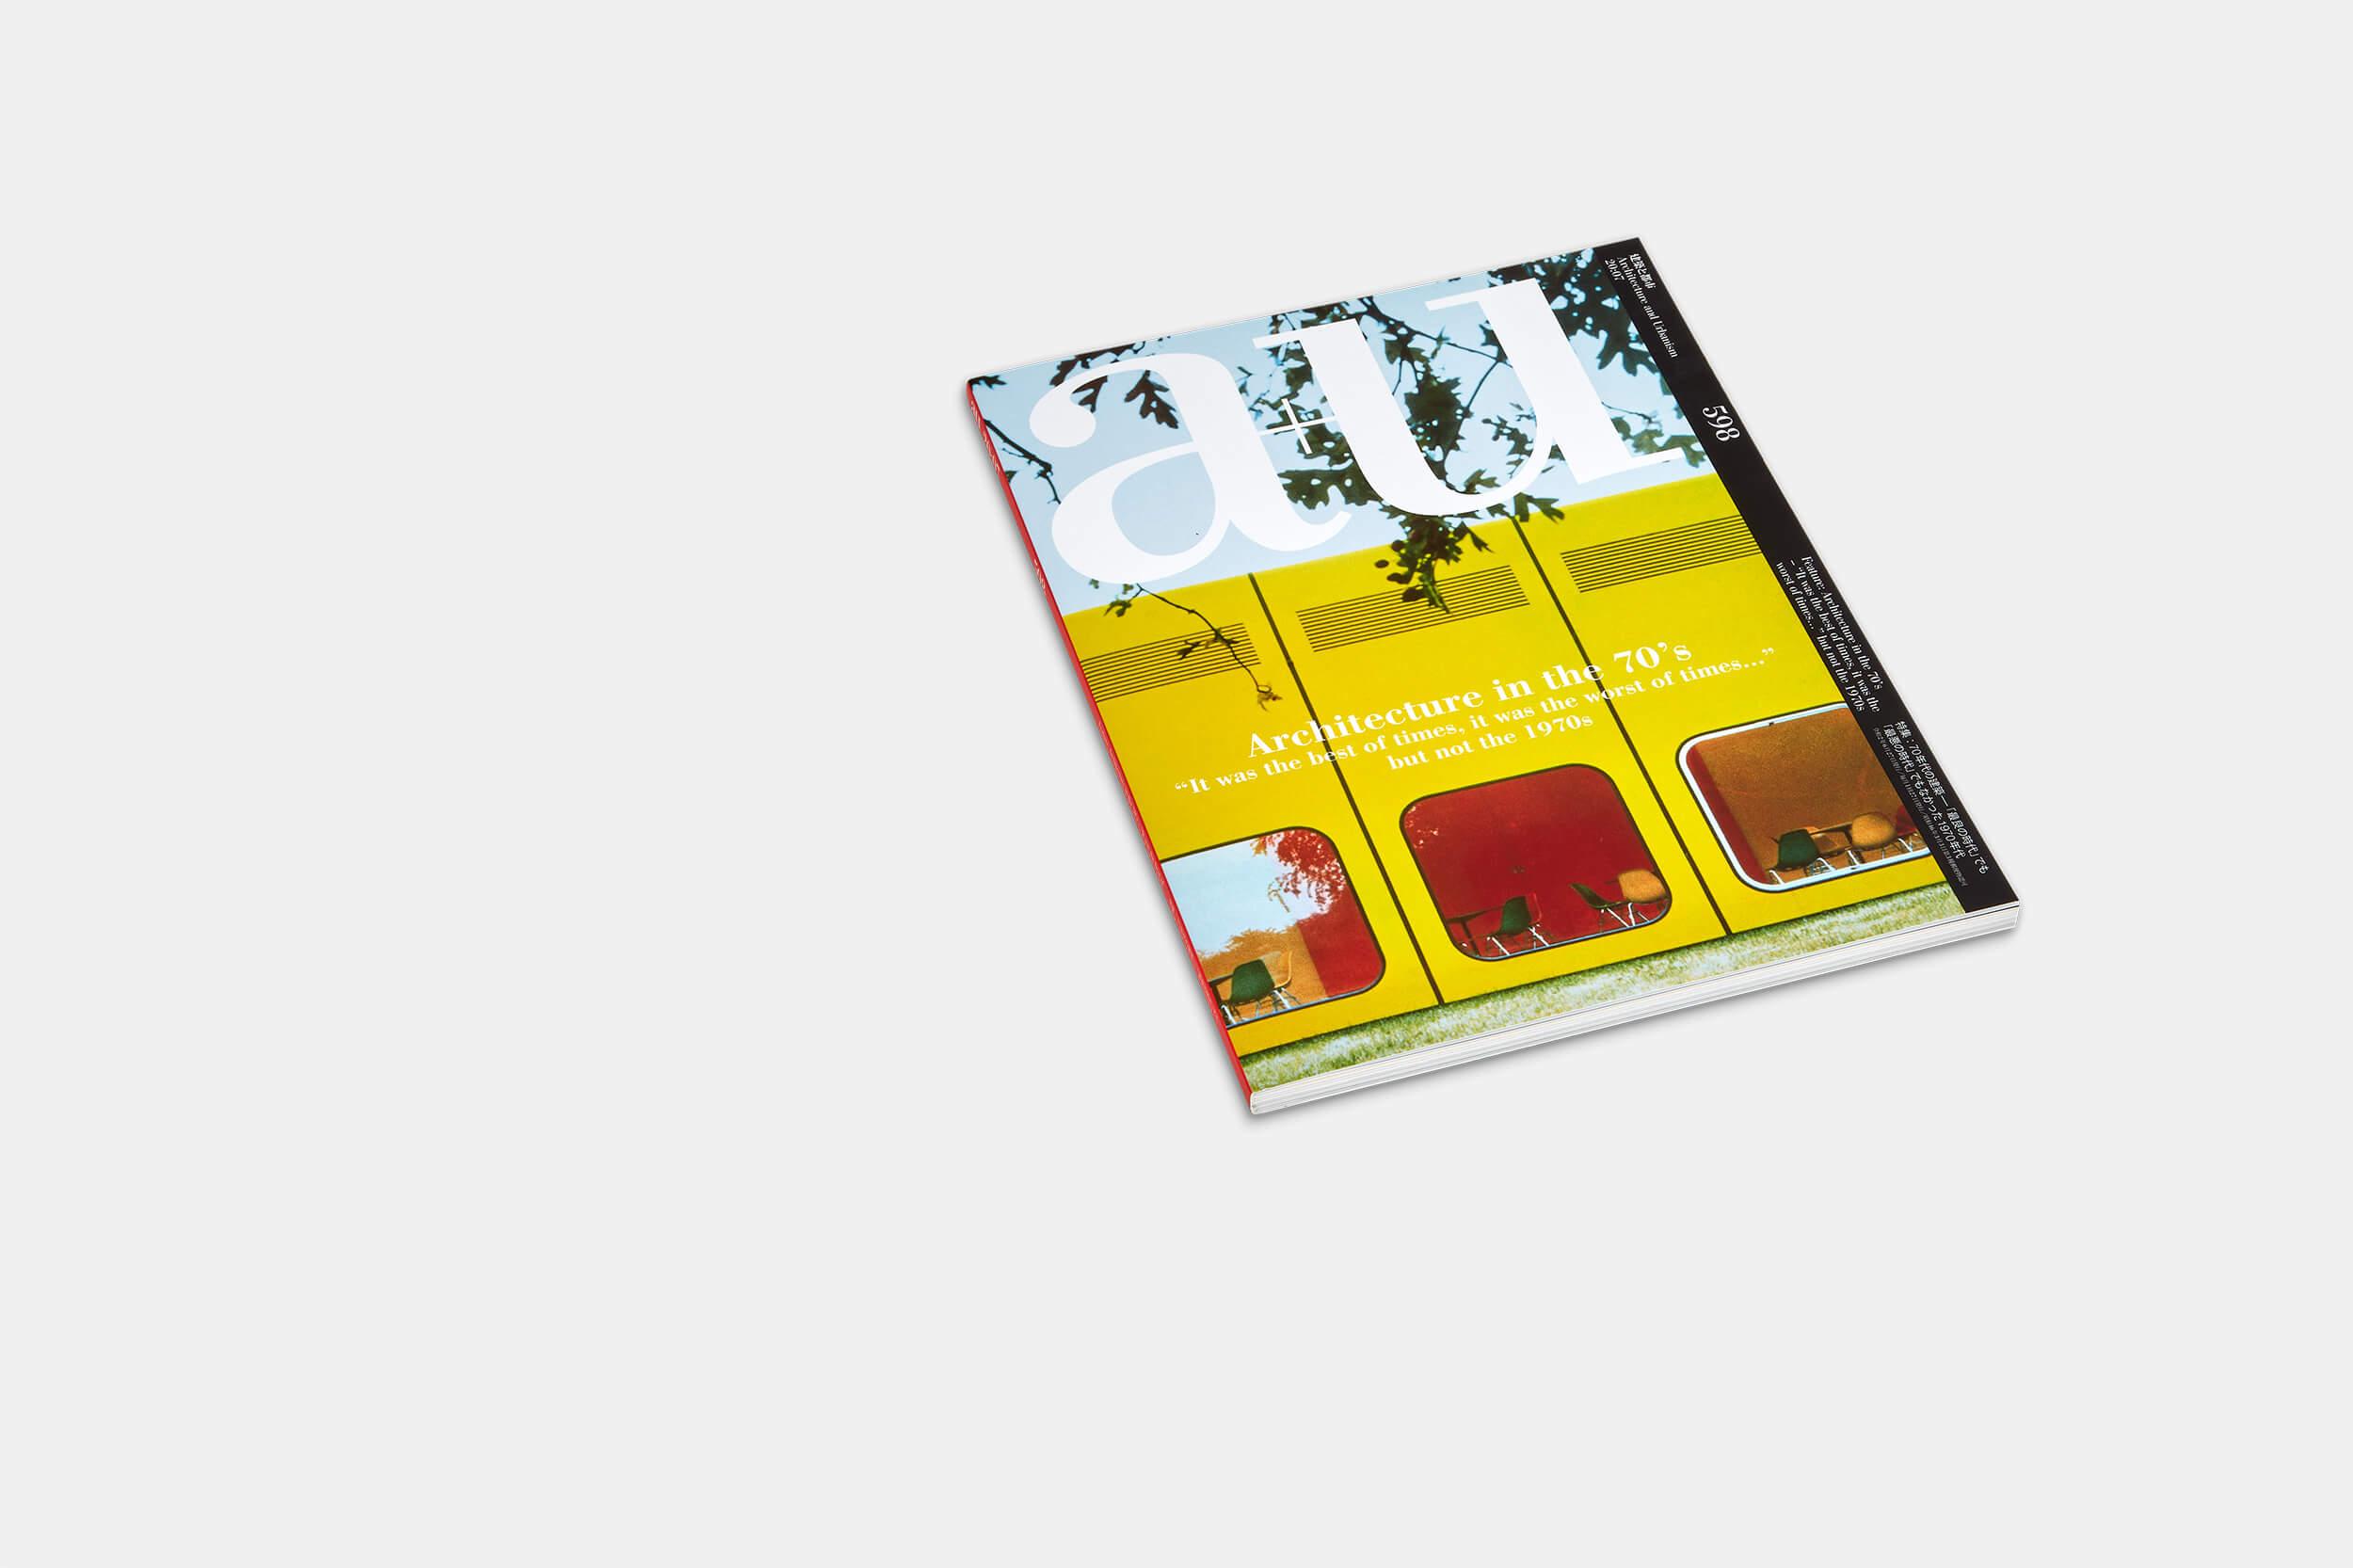 Tomba Brion – Architetto Carlo Scarpa – A+U July 2020